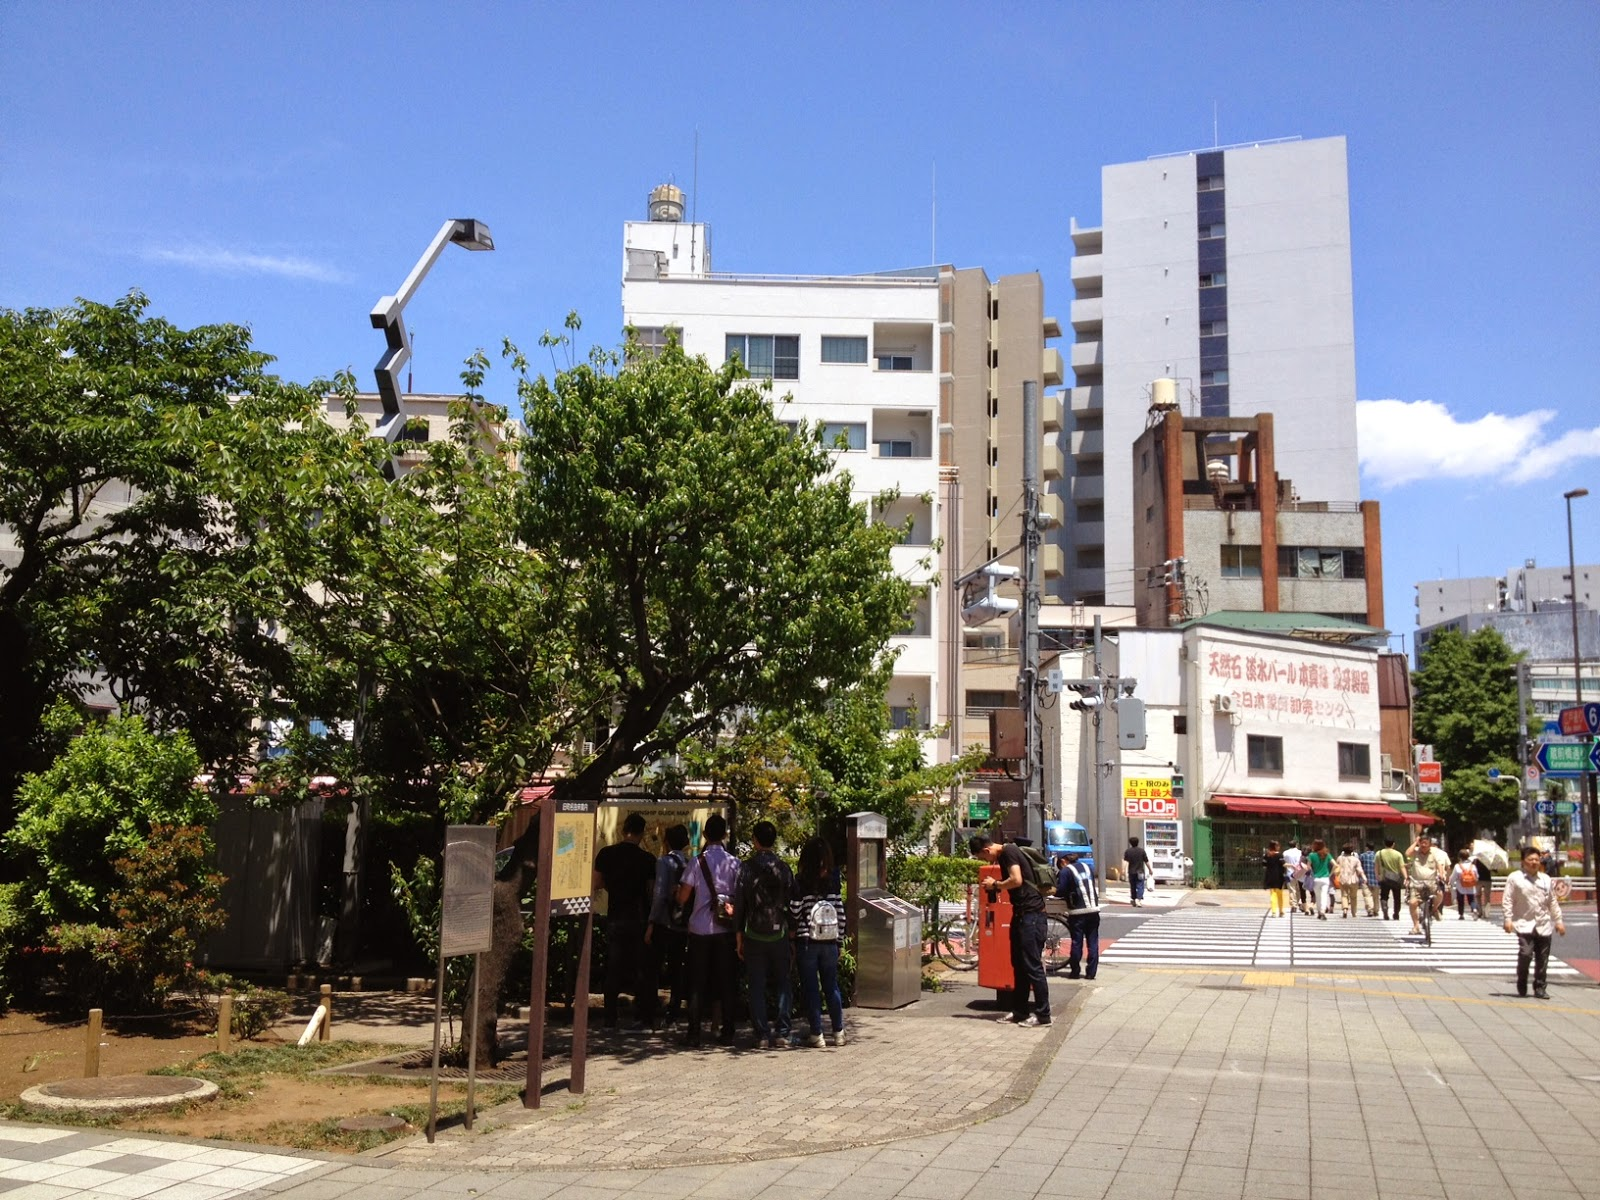 Kuramae 1-chome intersection, Taito ward, Tokyo.